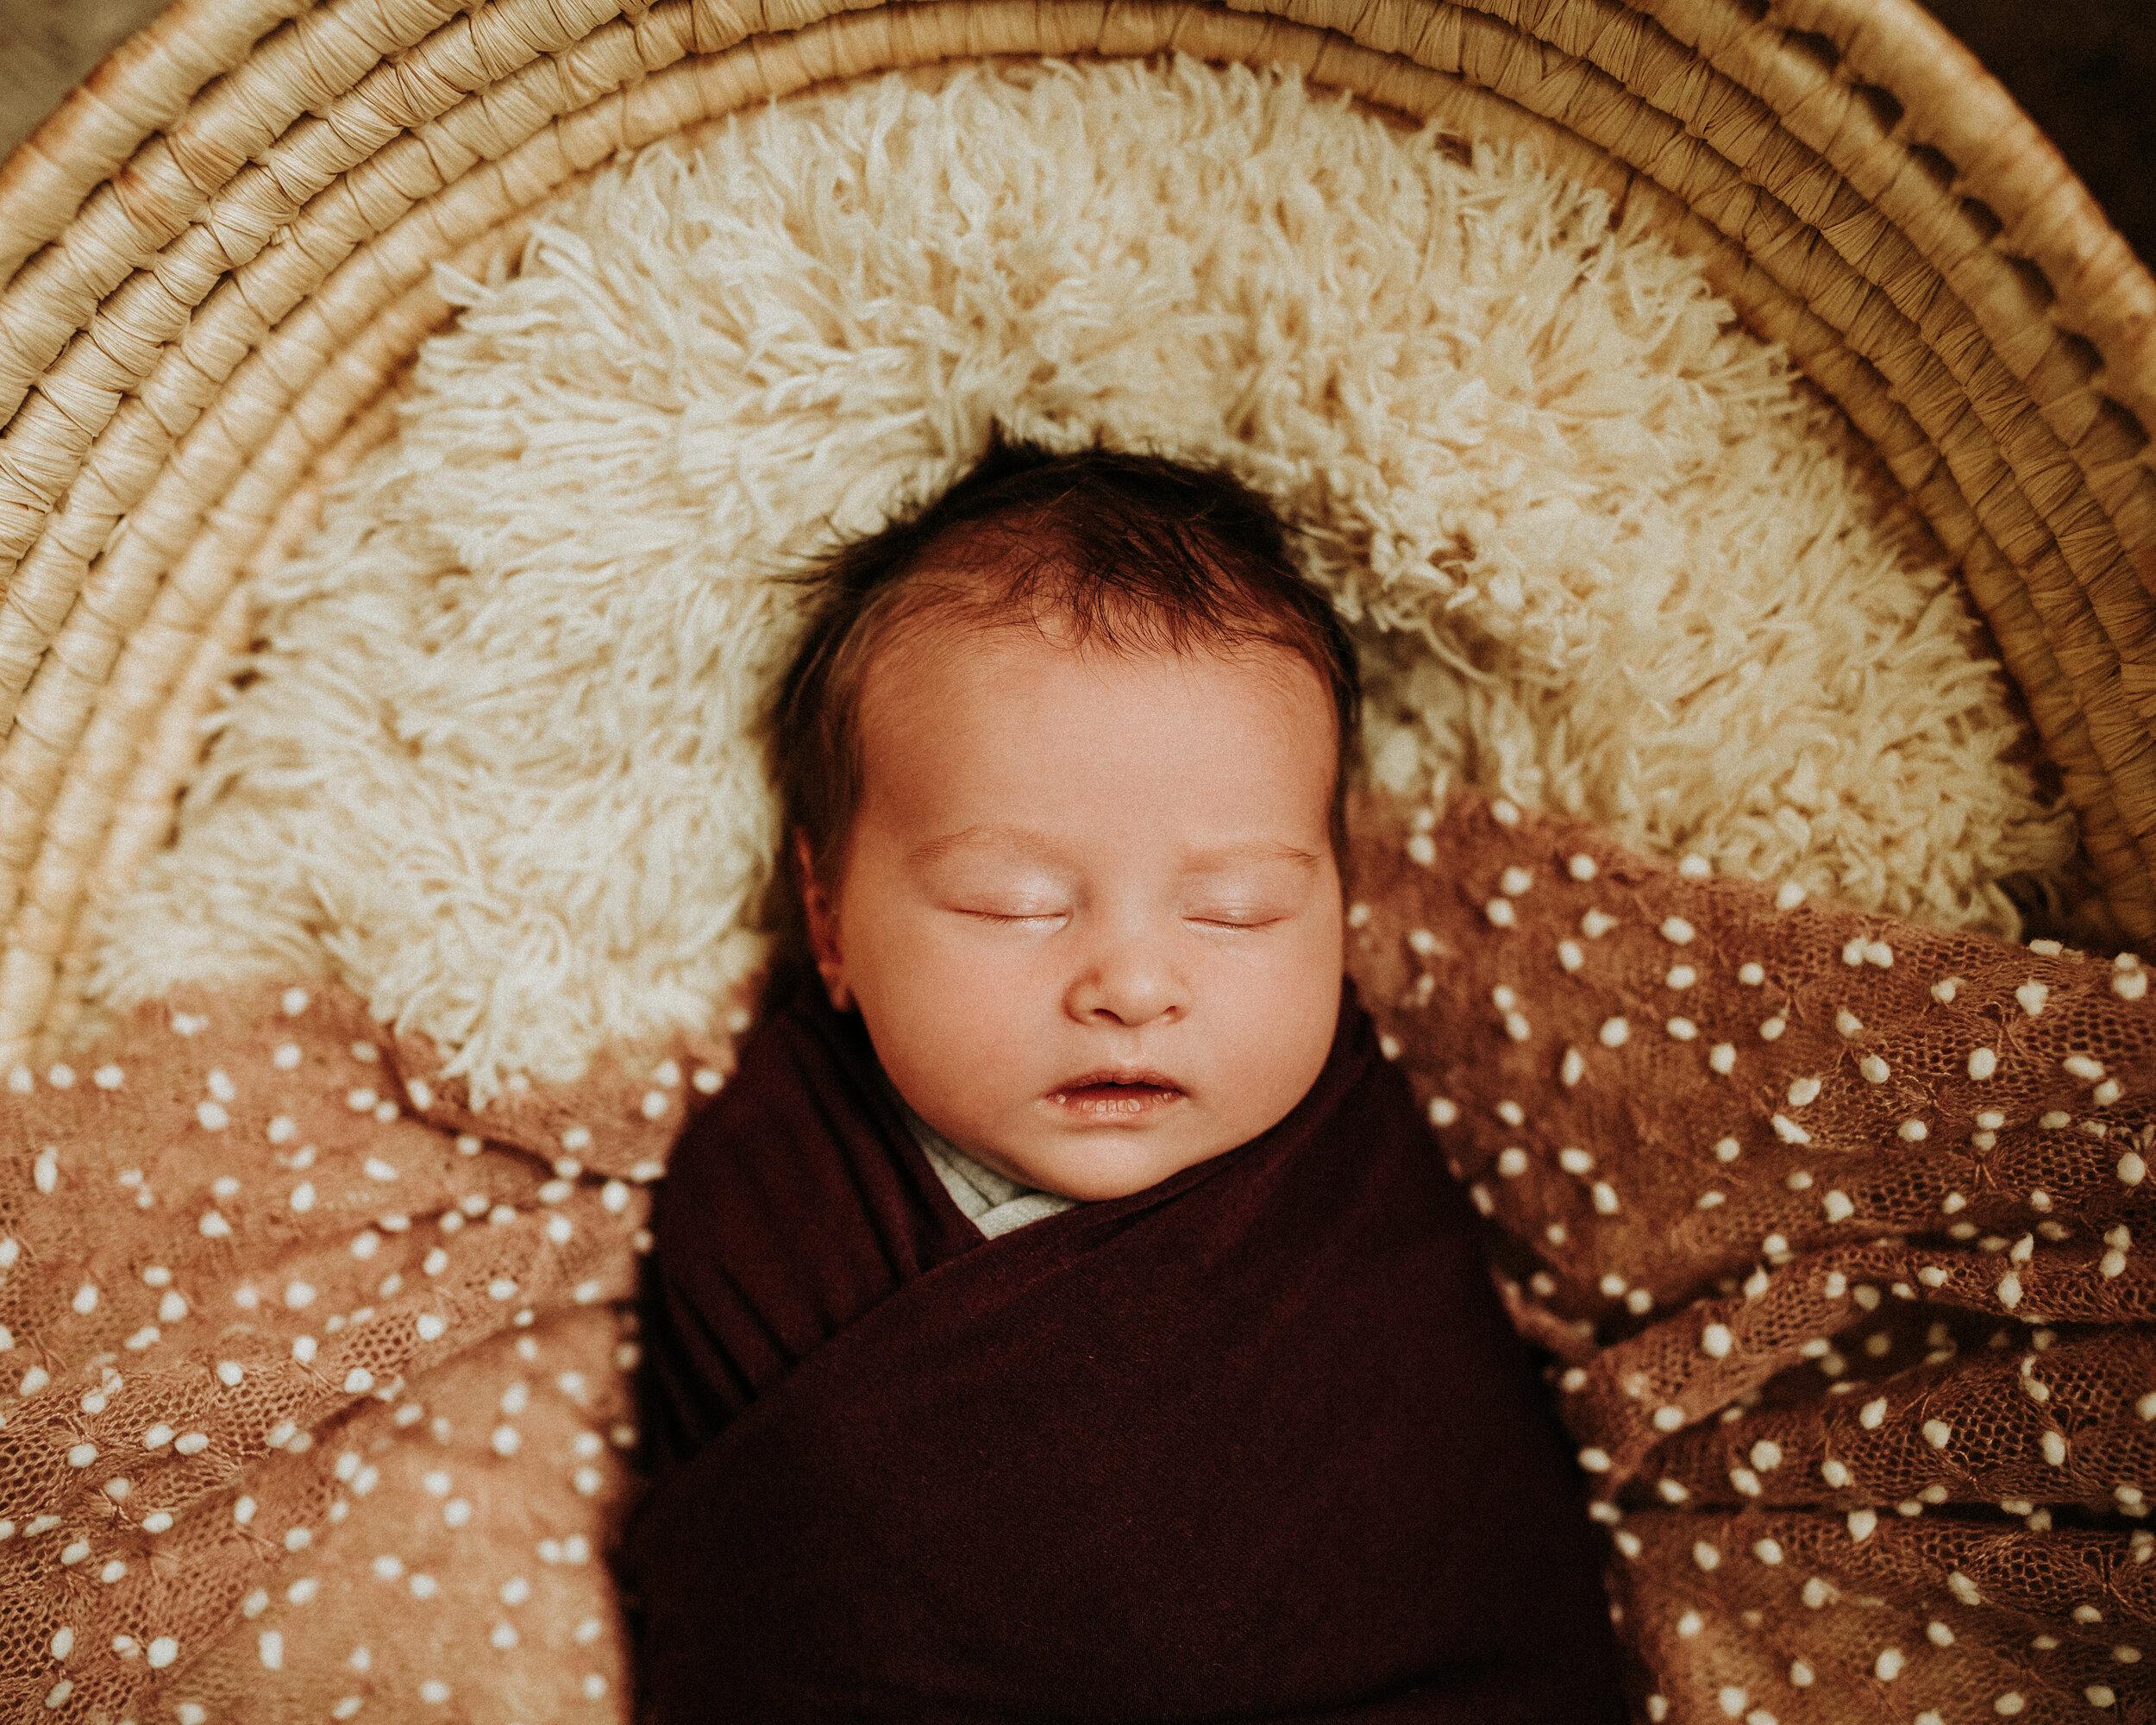 Newborn-Photographer-Bellingham-Wa-Brianne-Bell-Photography-(Dottie)-23.jpg